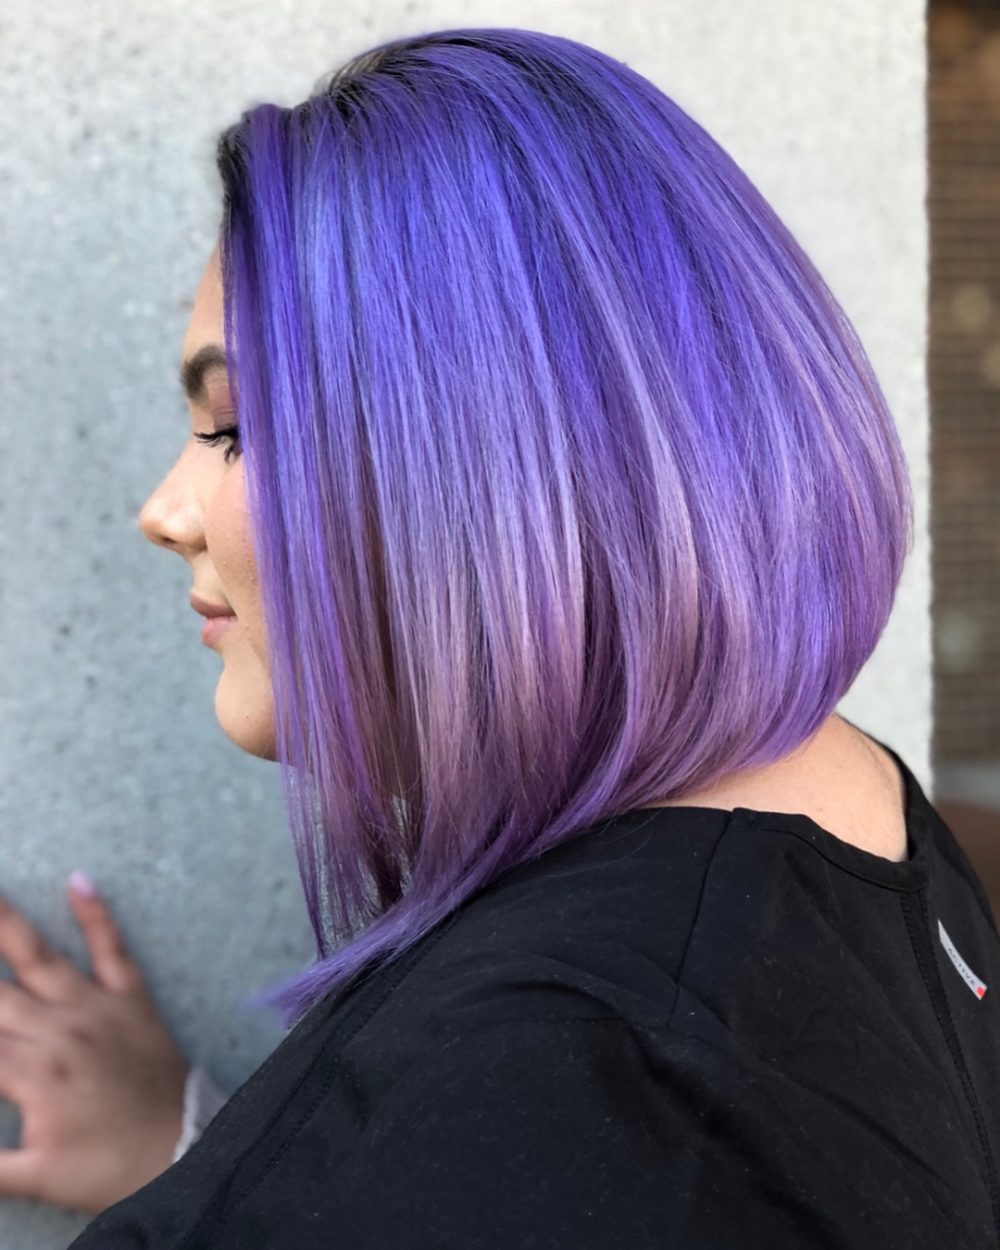 Unicorn Lob hairstyle